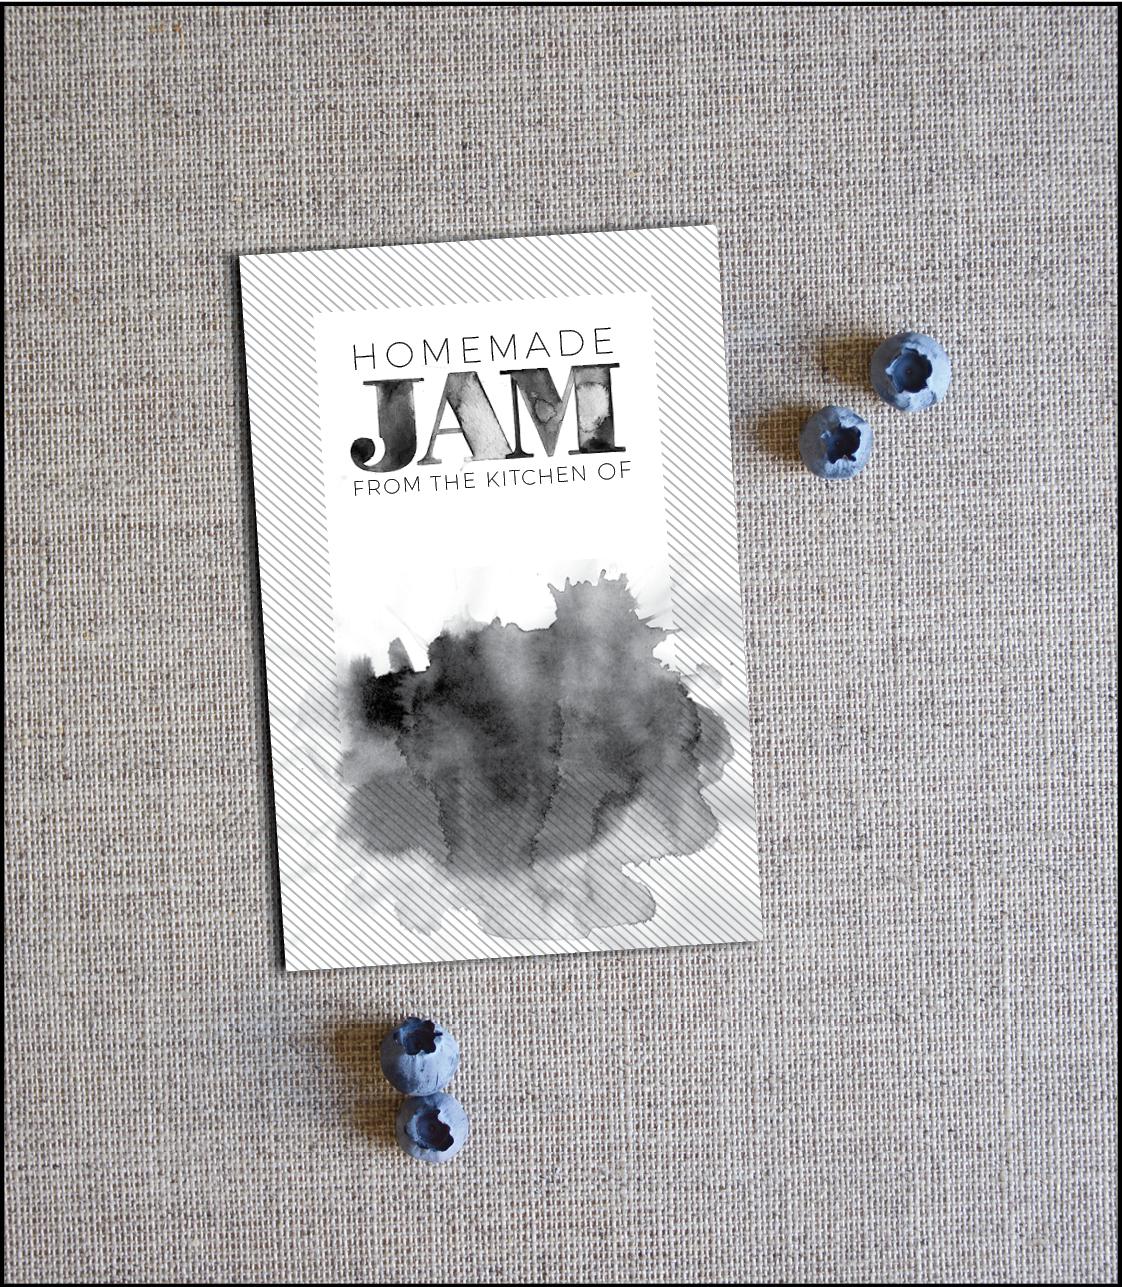 jam_session_2015_03